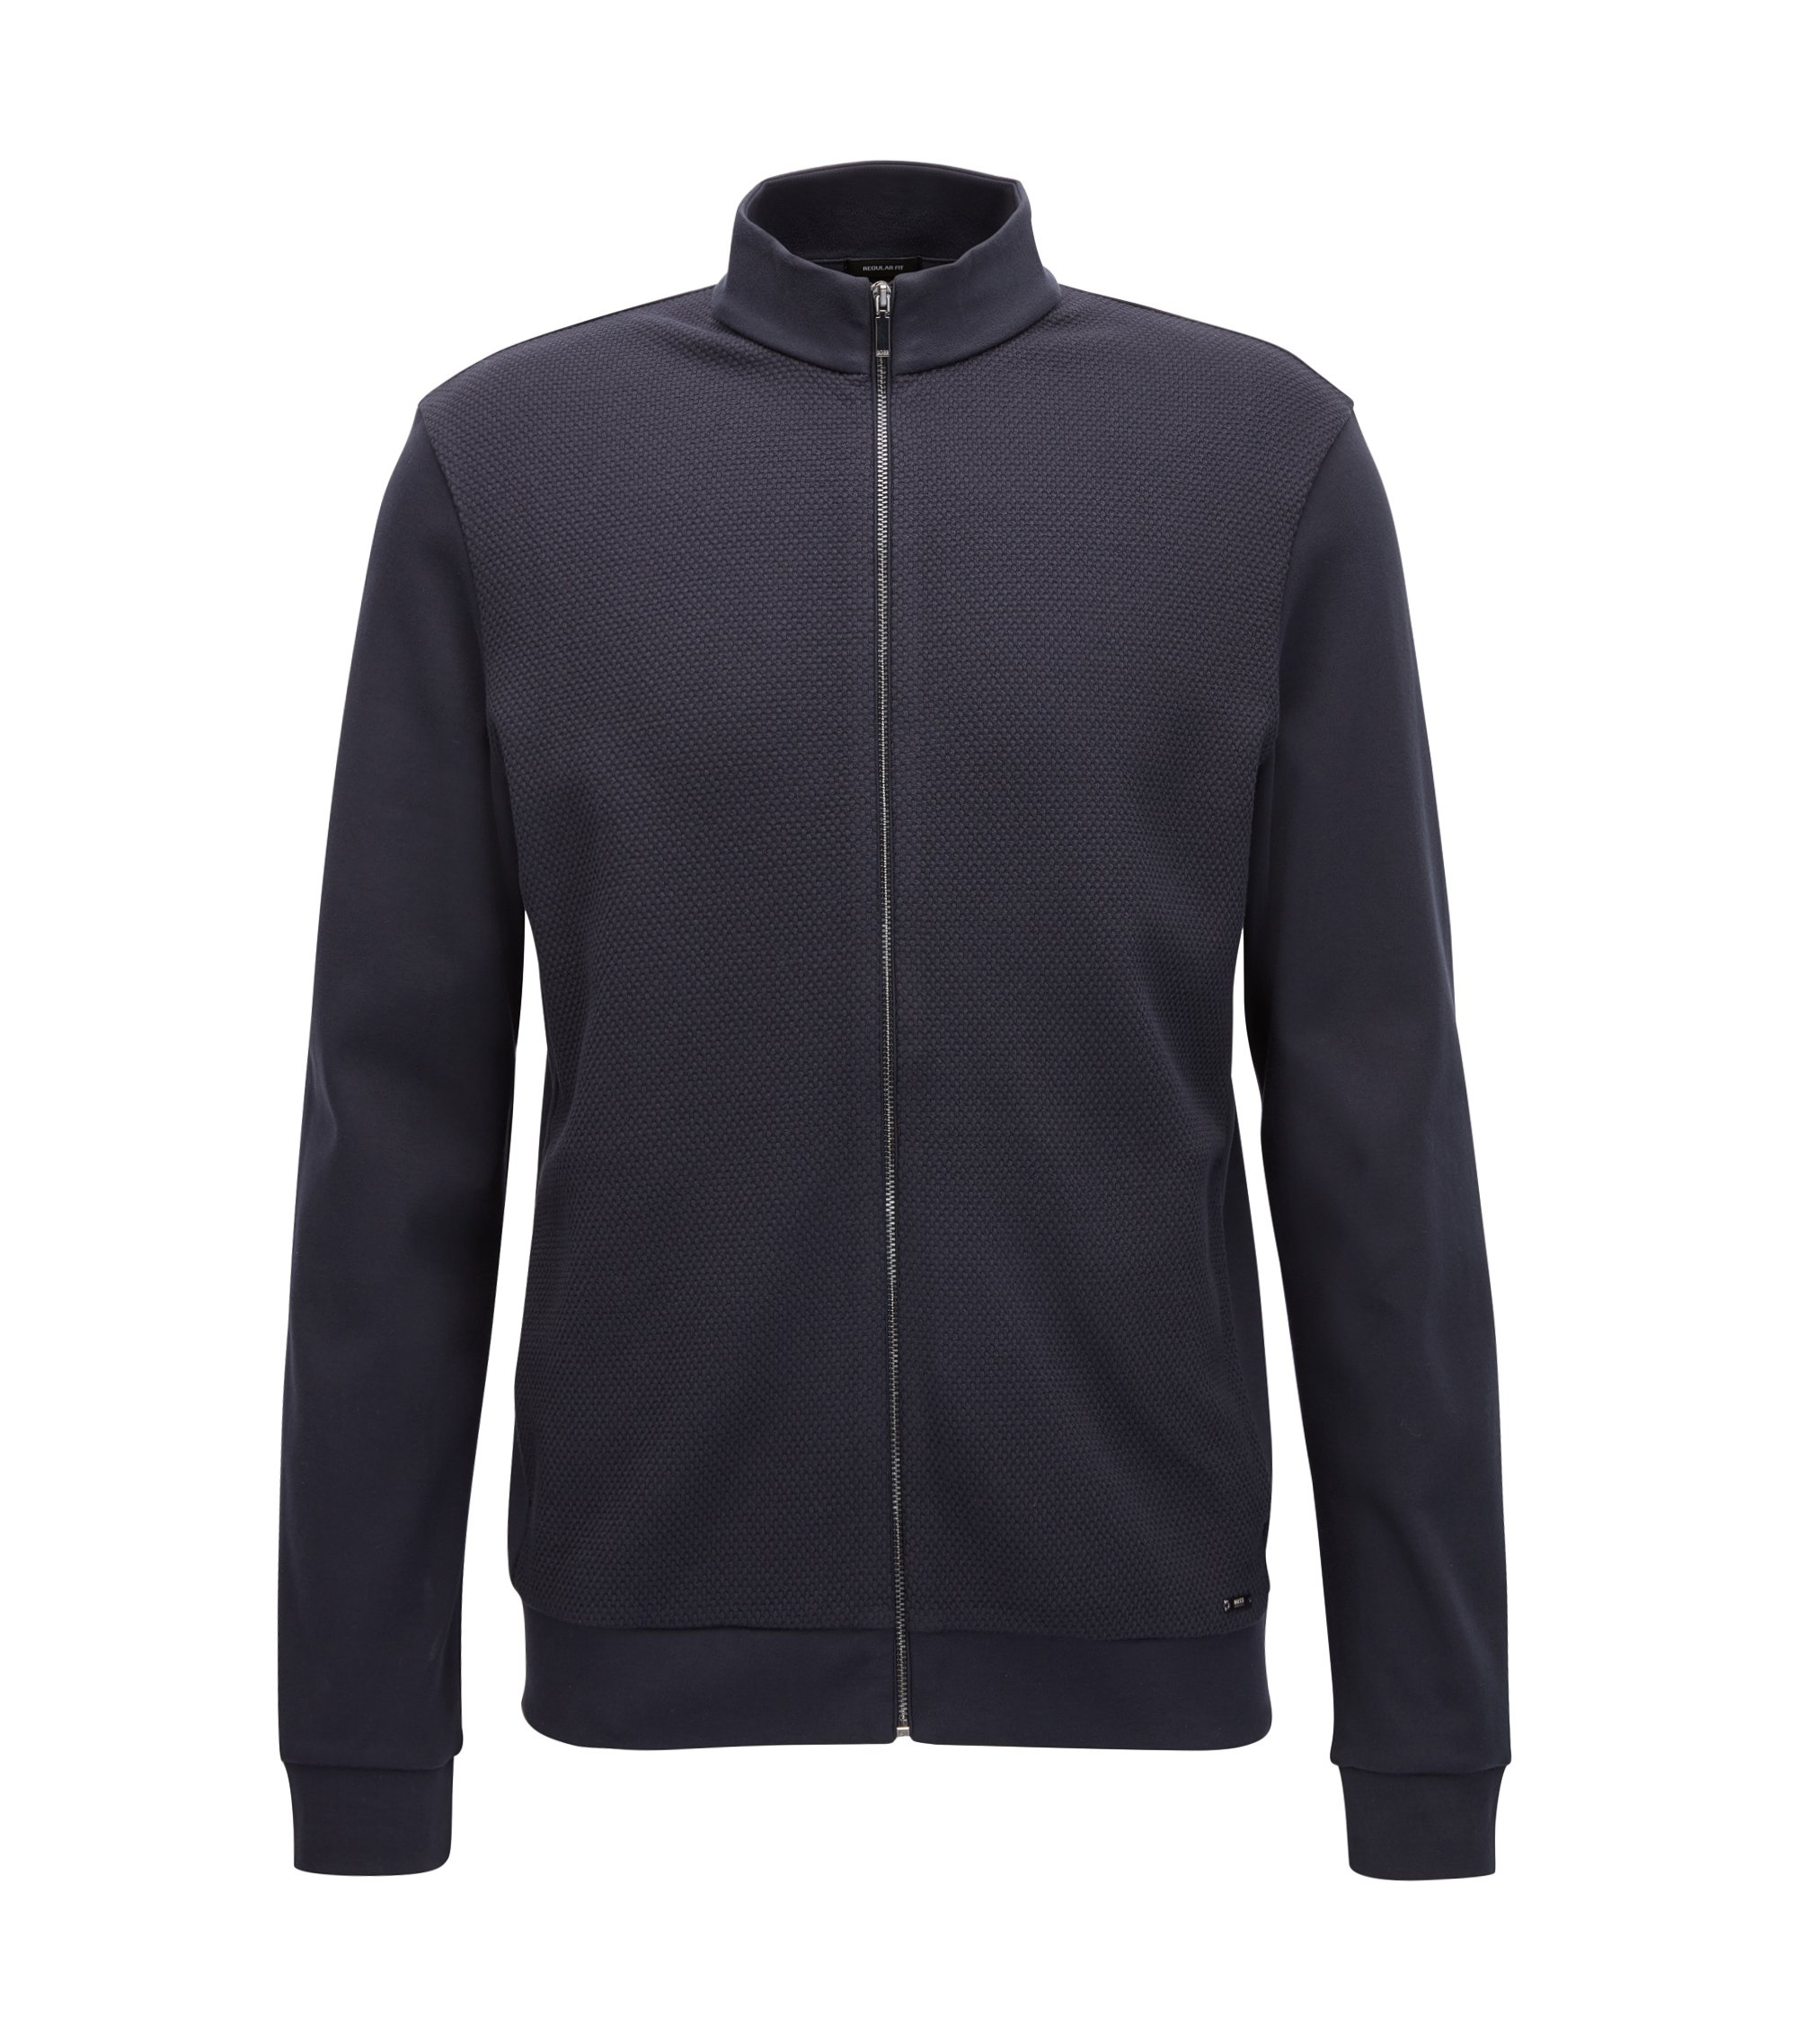 Regular-fit sweatshirt jacket in cotton with a textured front: 'Skiles 02', Dark Blue